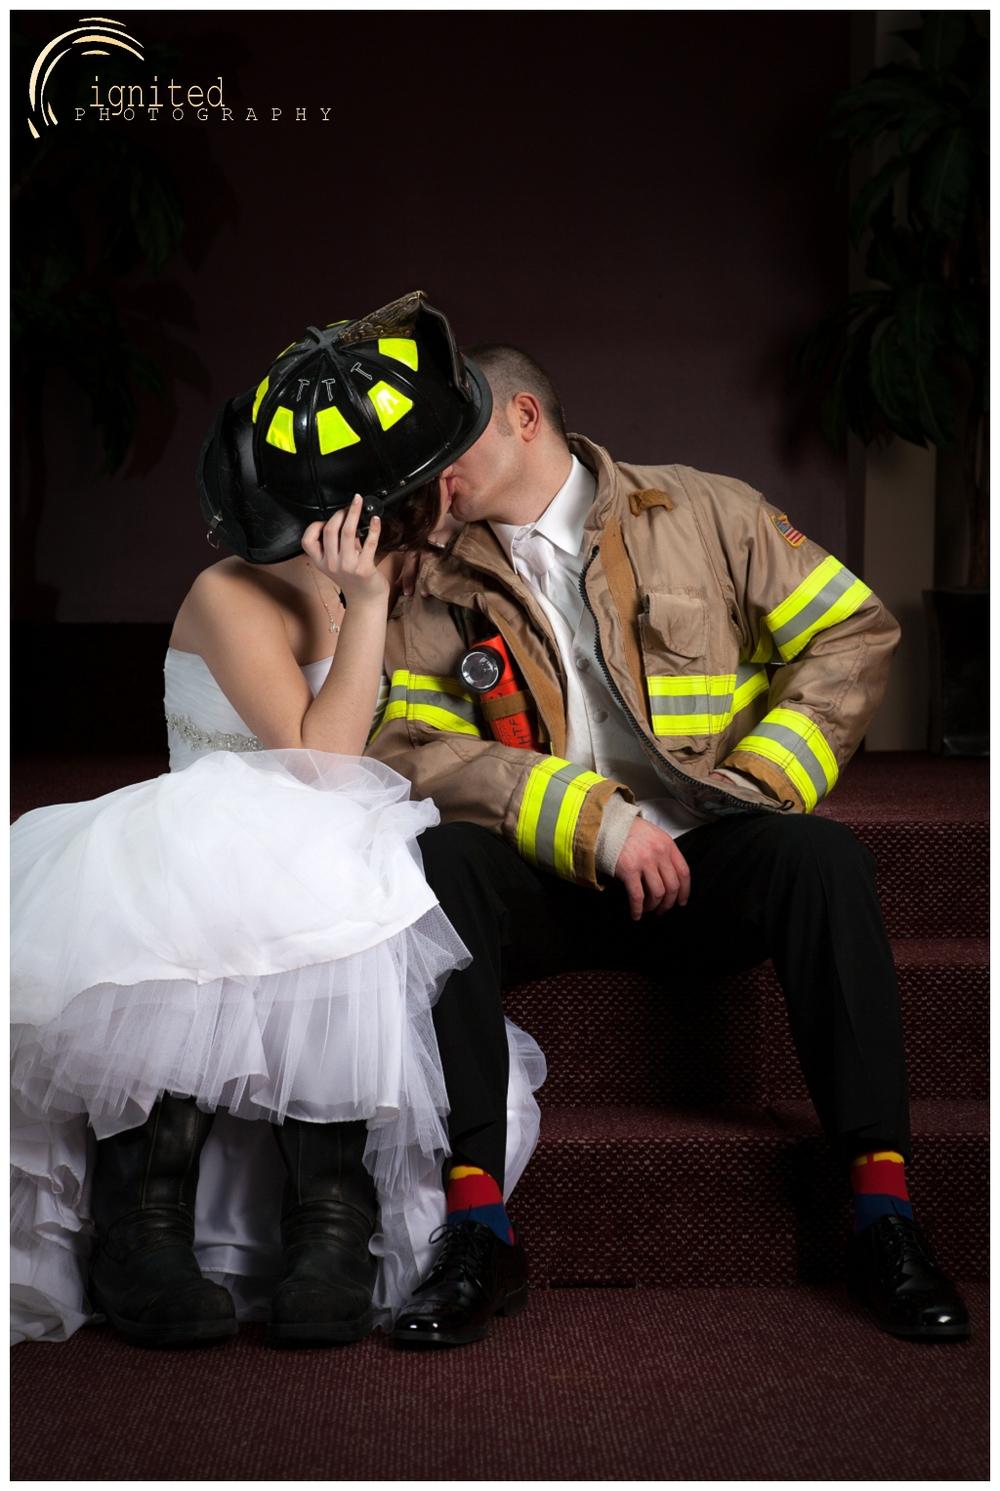 ignited Photography Alyssa  Castwell and Caleb Merna Wedding Brighton Nazarene The Naz Howell MI_0044.jpg